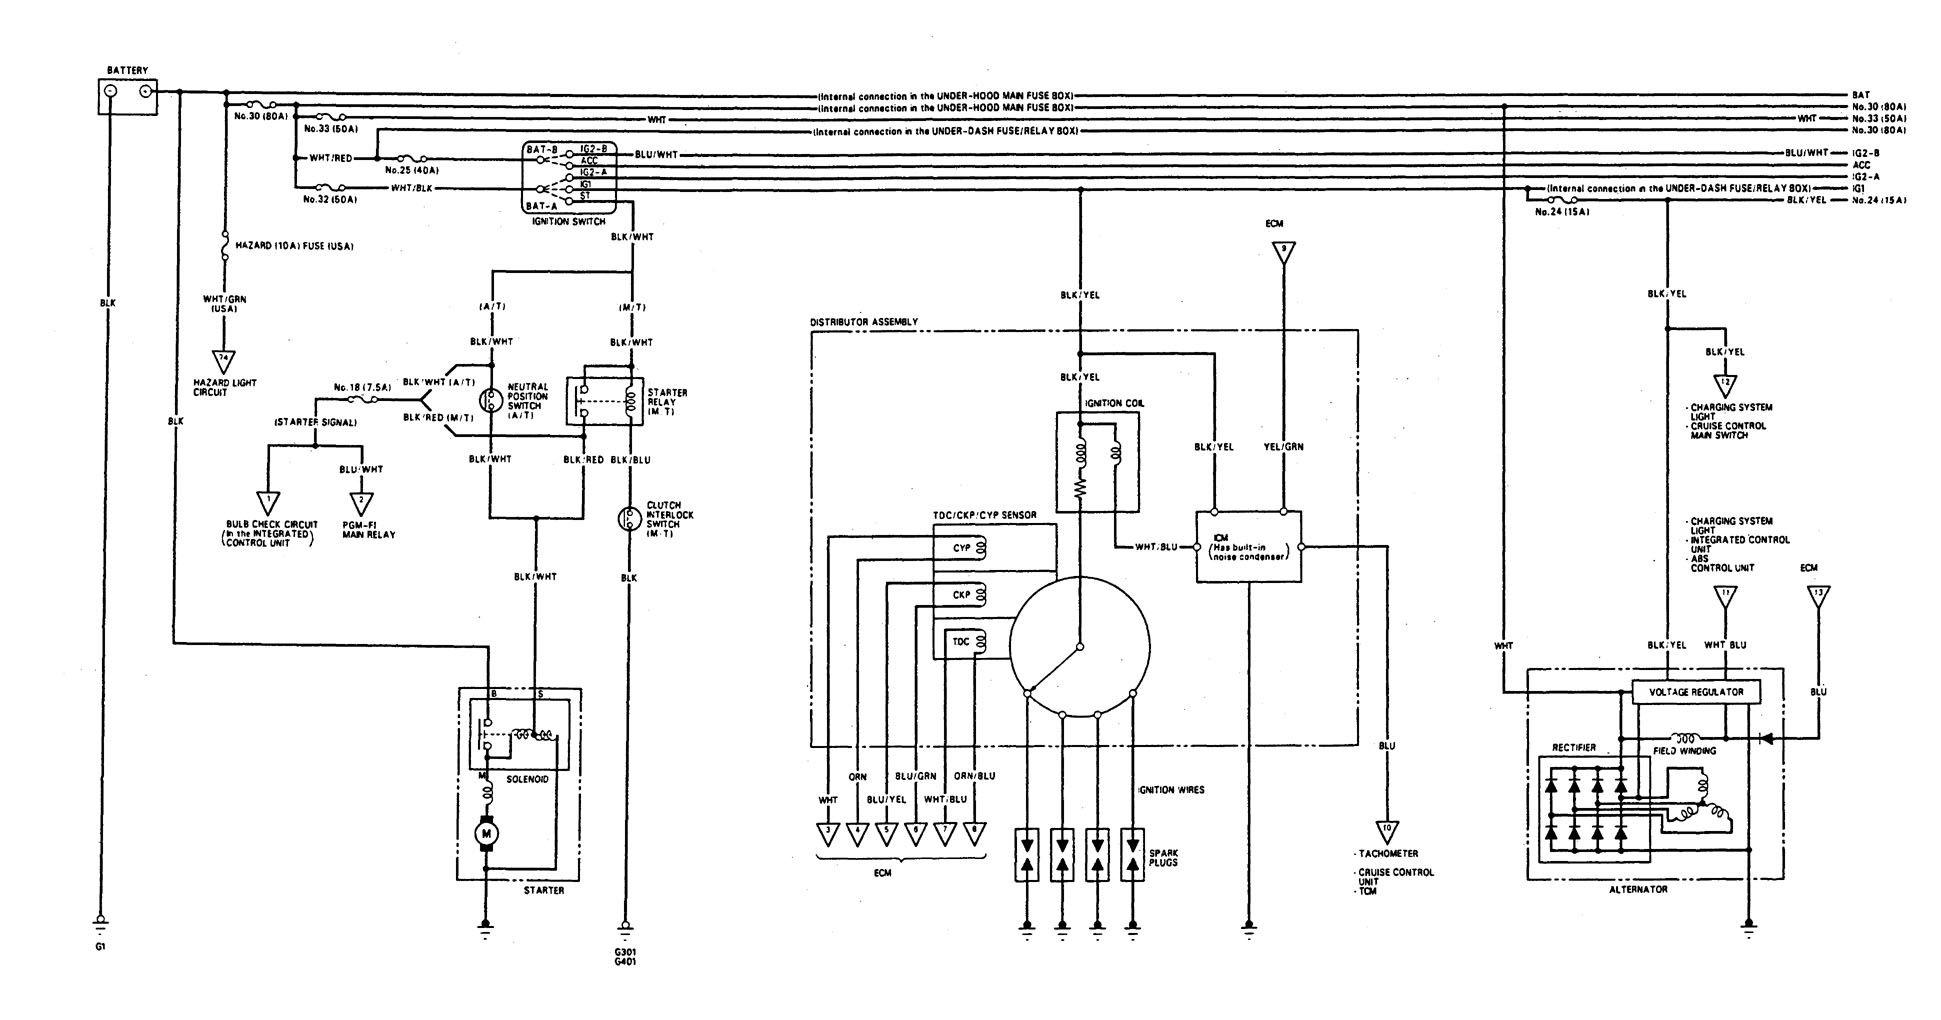 1993 acura integra fuse box diagram